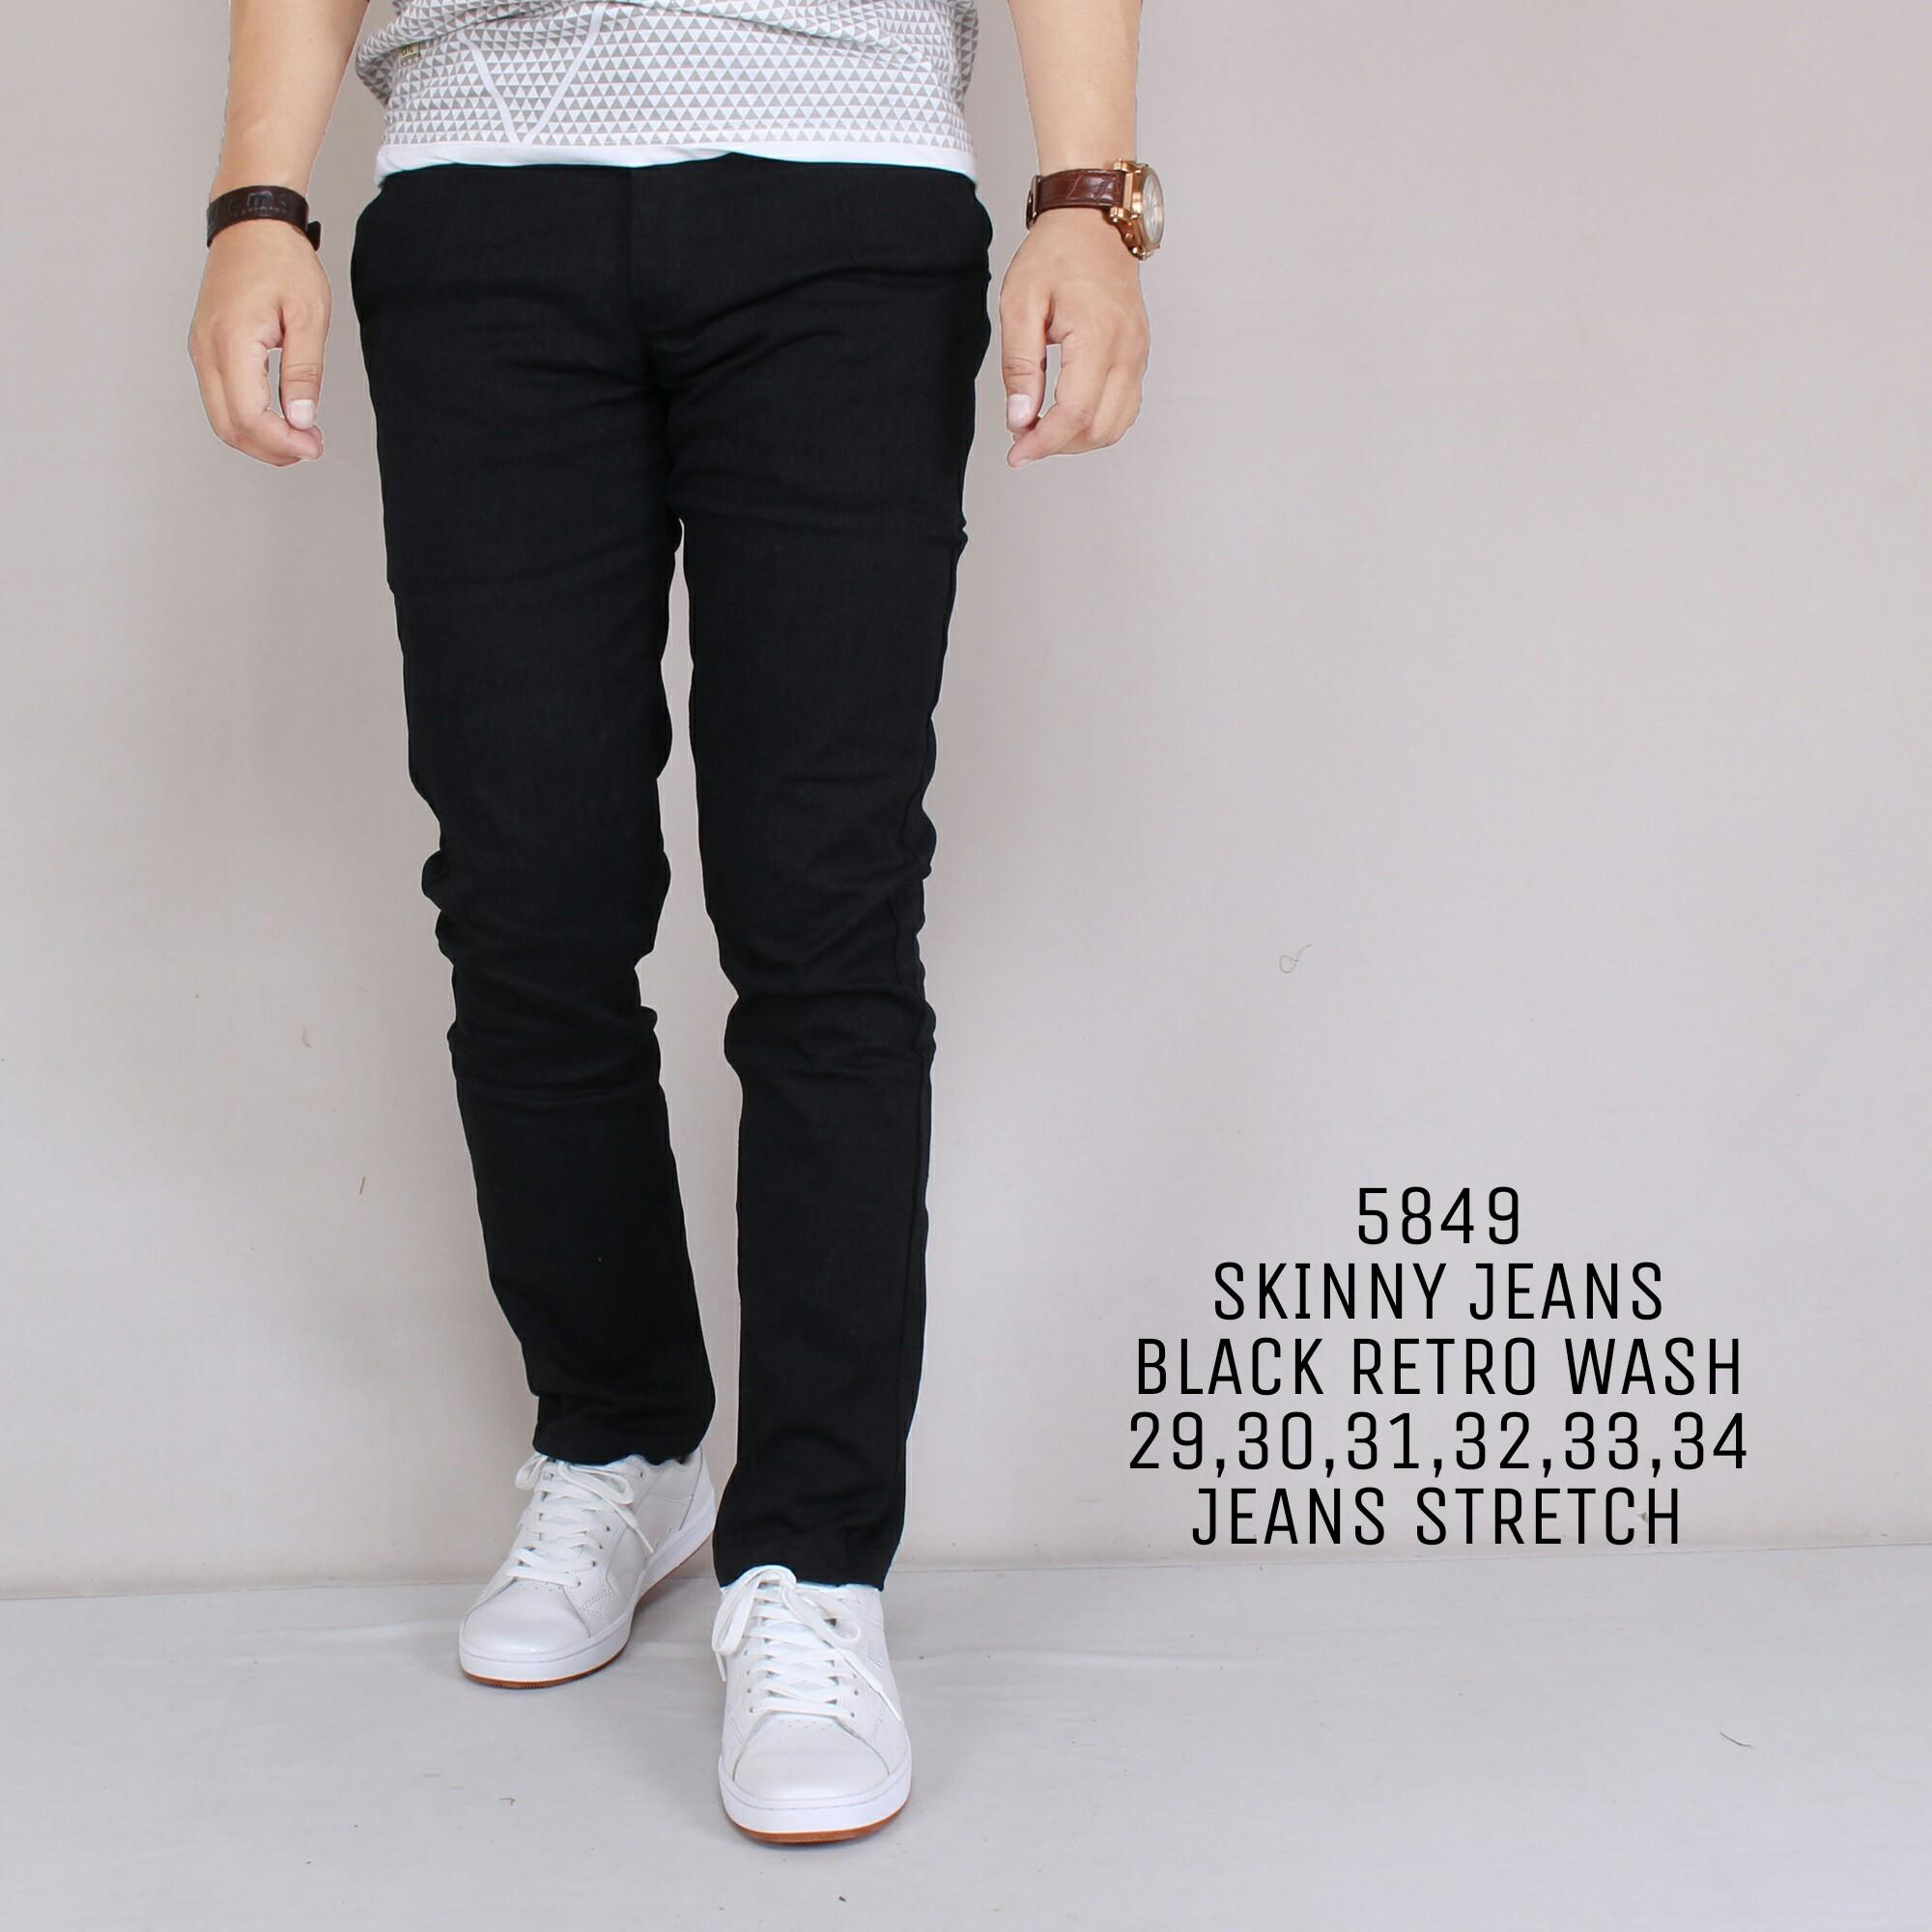 Zoeystore 5849 Celena Jeans Panjang Pria Celana Jeans Skinny Cowok Washing Black Cut Rips Celana Jeans Slimfit Denim